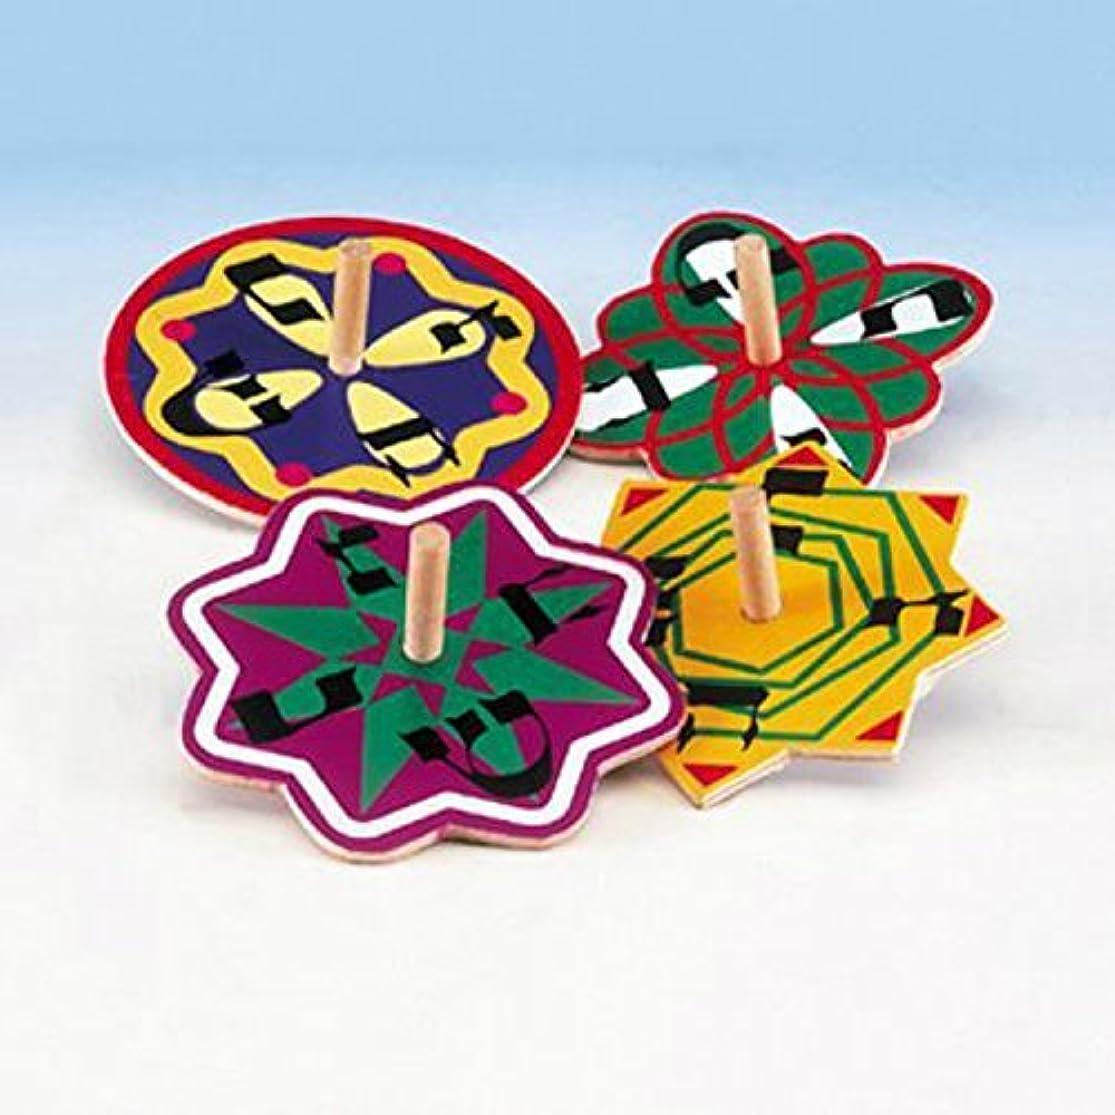 Hanukkah Veriety Pack Spinning Colorful Painted Wood Dreidel Set 4 Pack wjbptwyq1